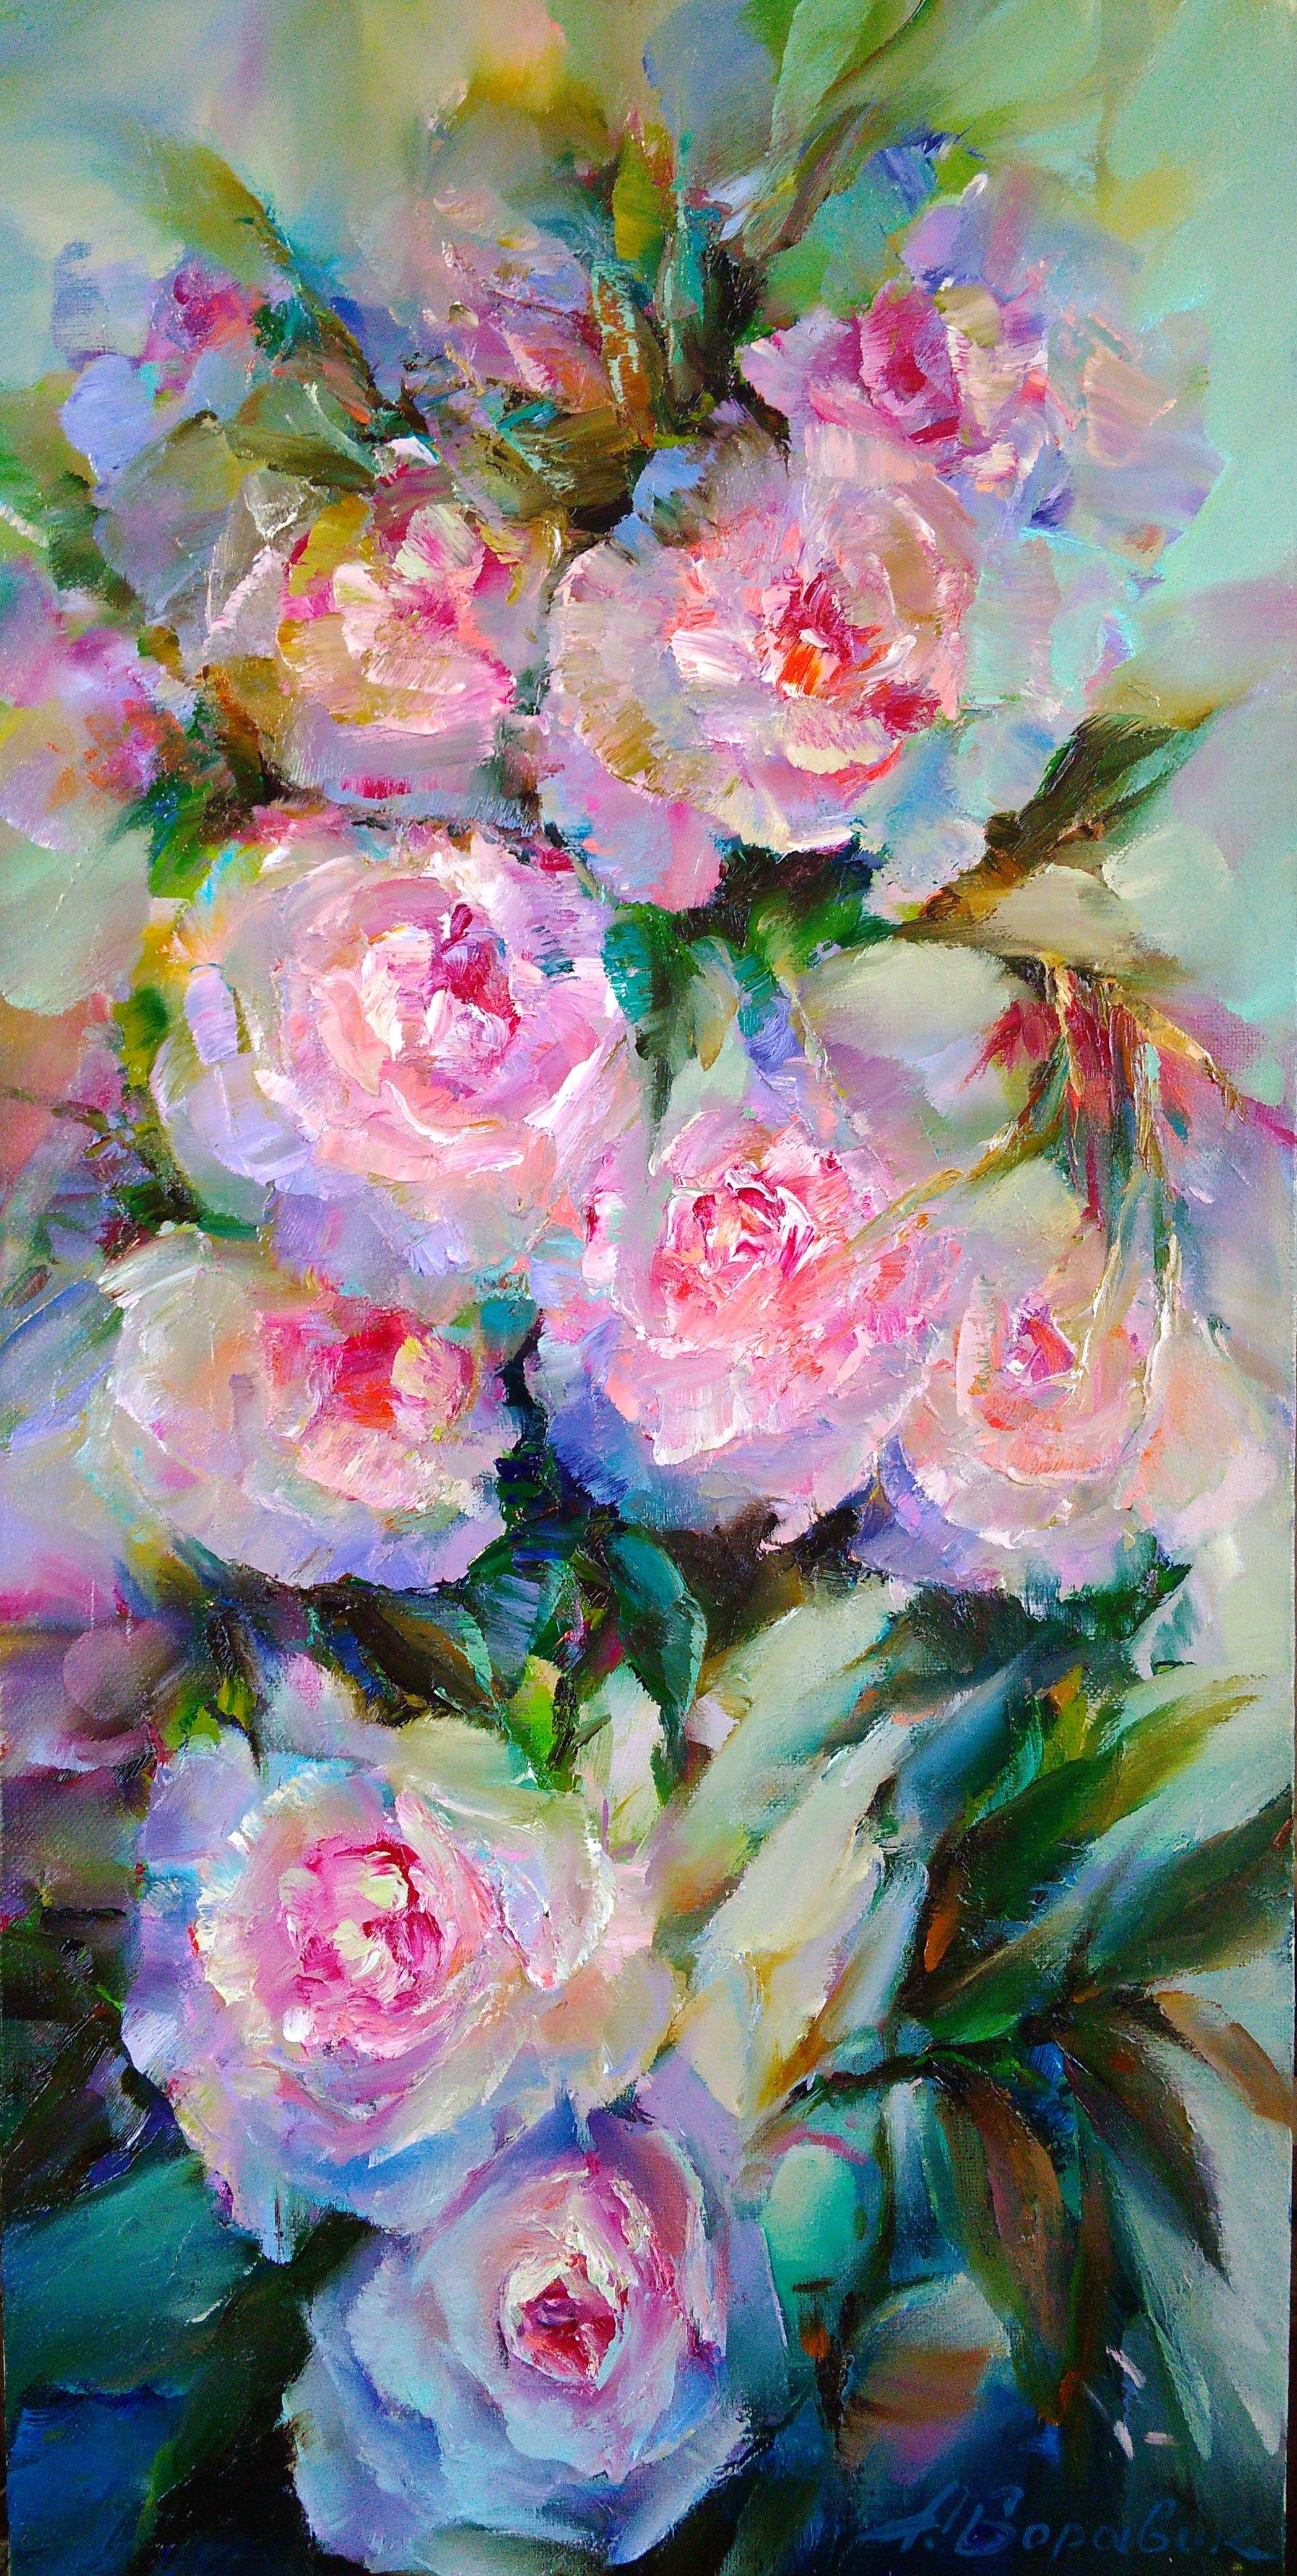 Andrei Ivanovich Boravik. Waltz of the Flowers